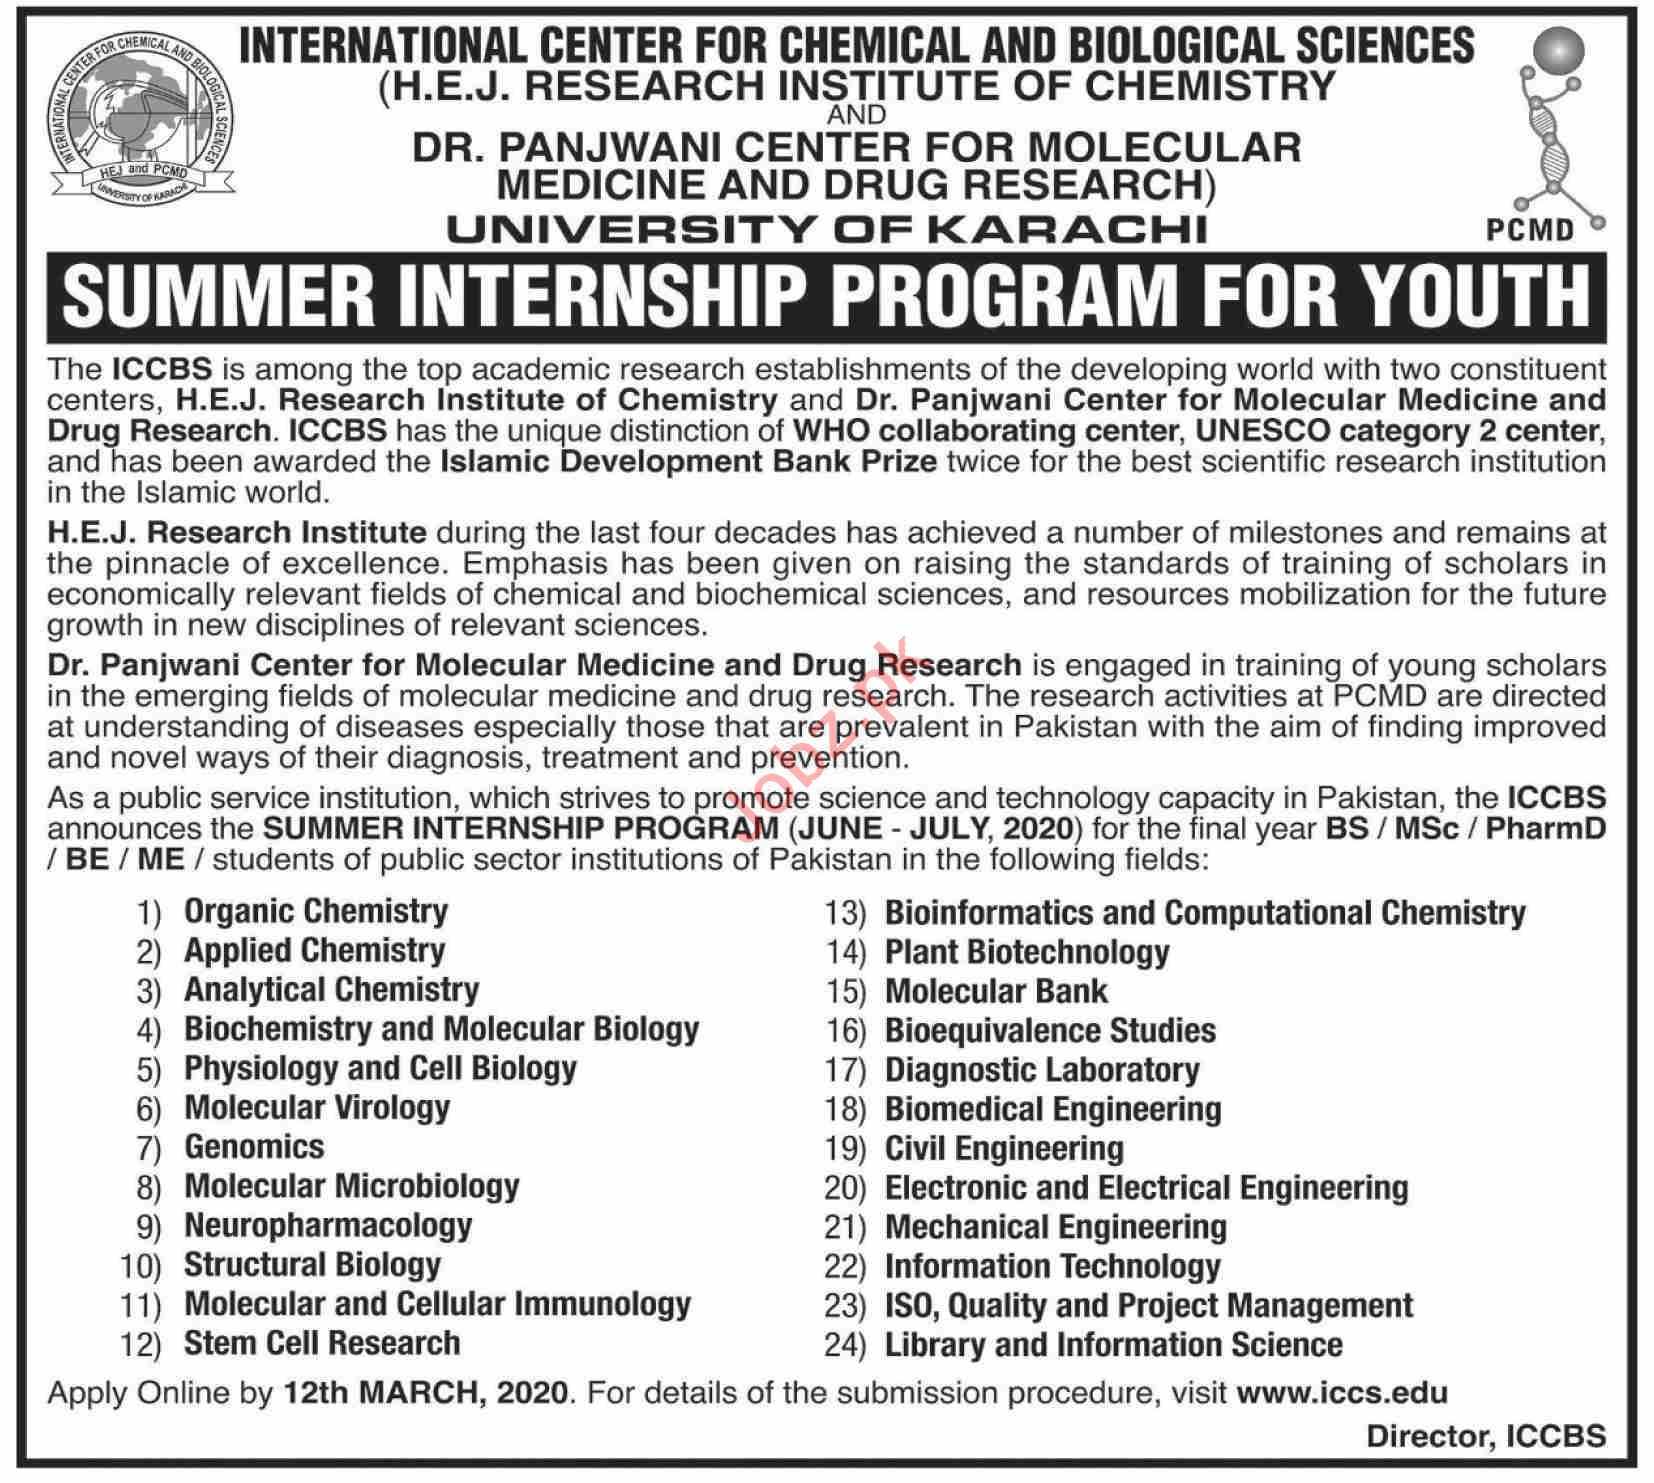 University of Karachi UoK Summer Internship Program 2020